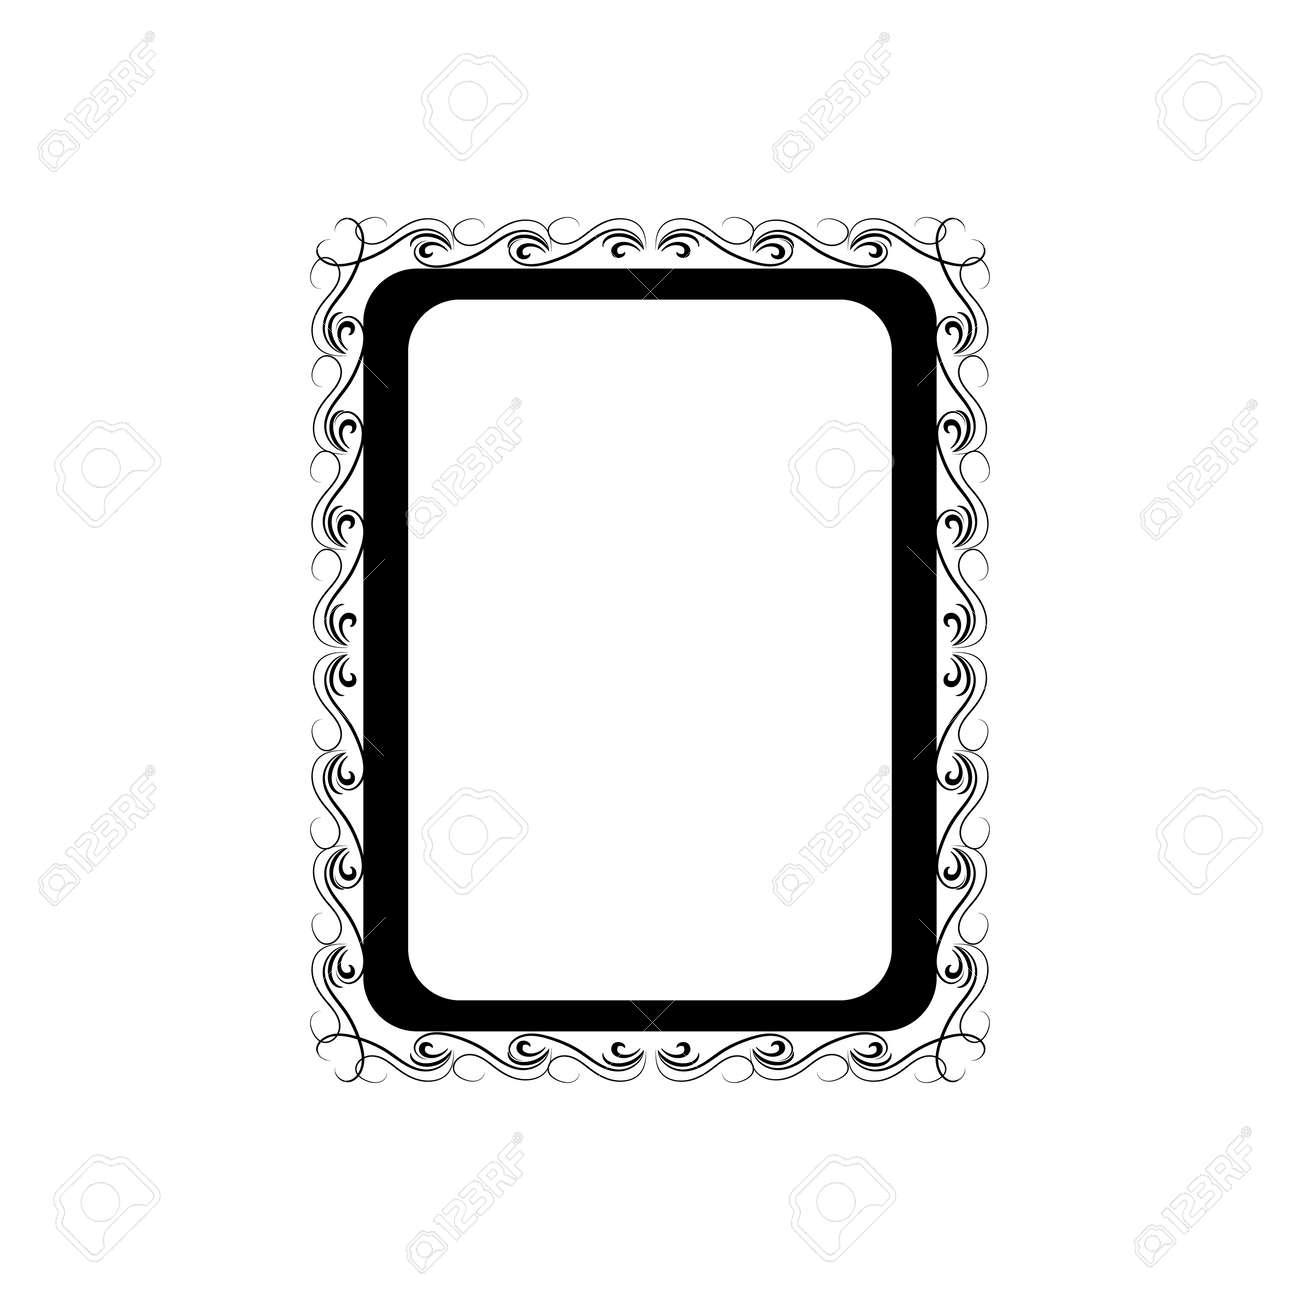 Monochrome frame with wavy line for pfoto. - 159702357